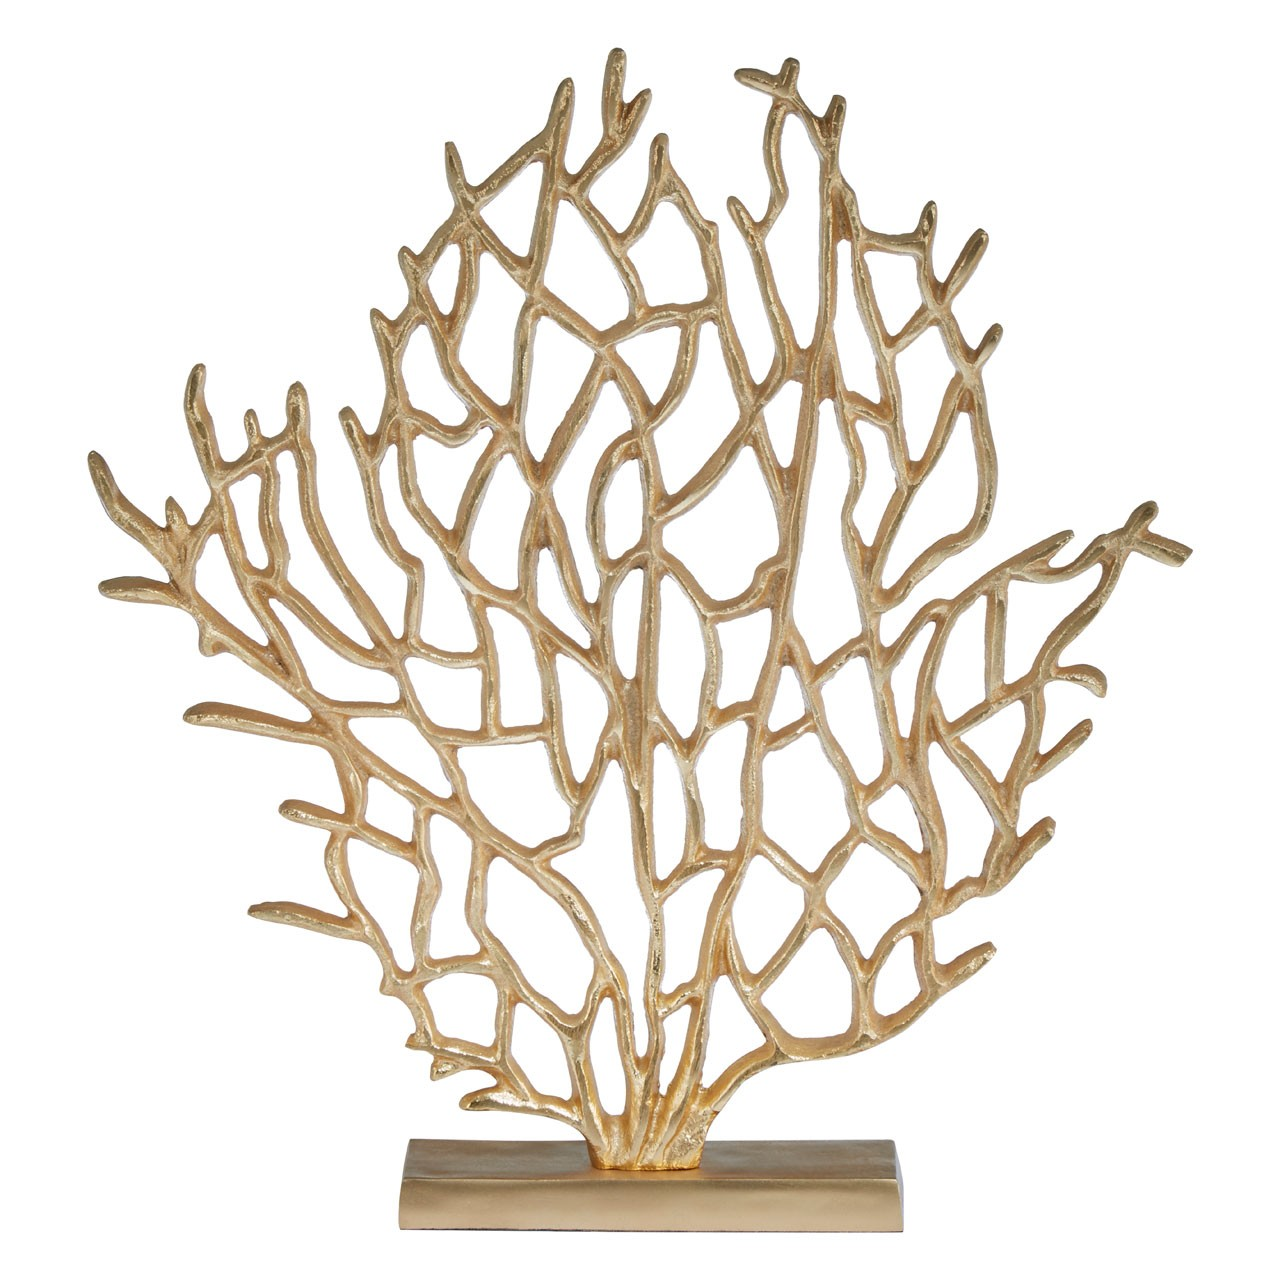 Prato Large Tree Sculpture, Gold